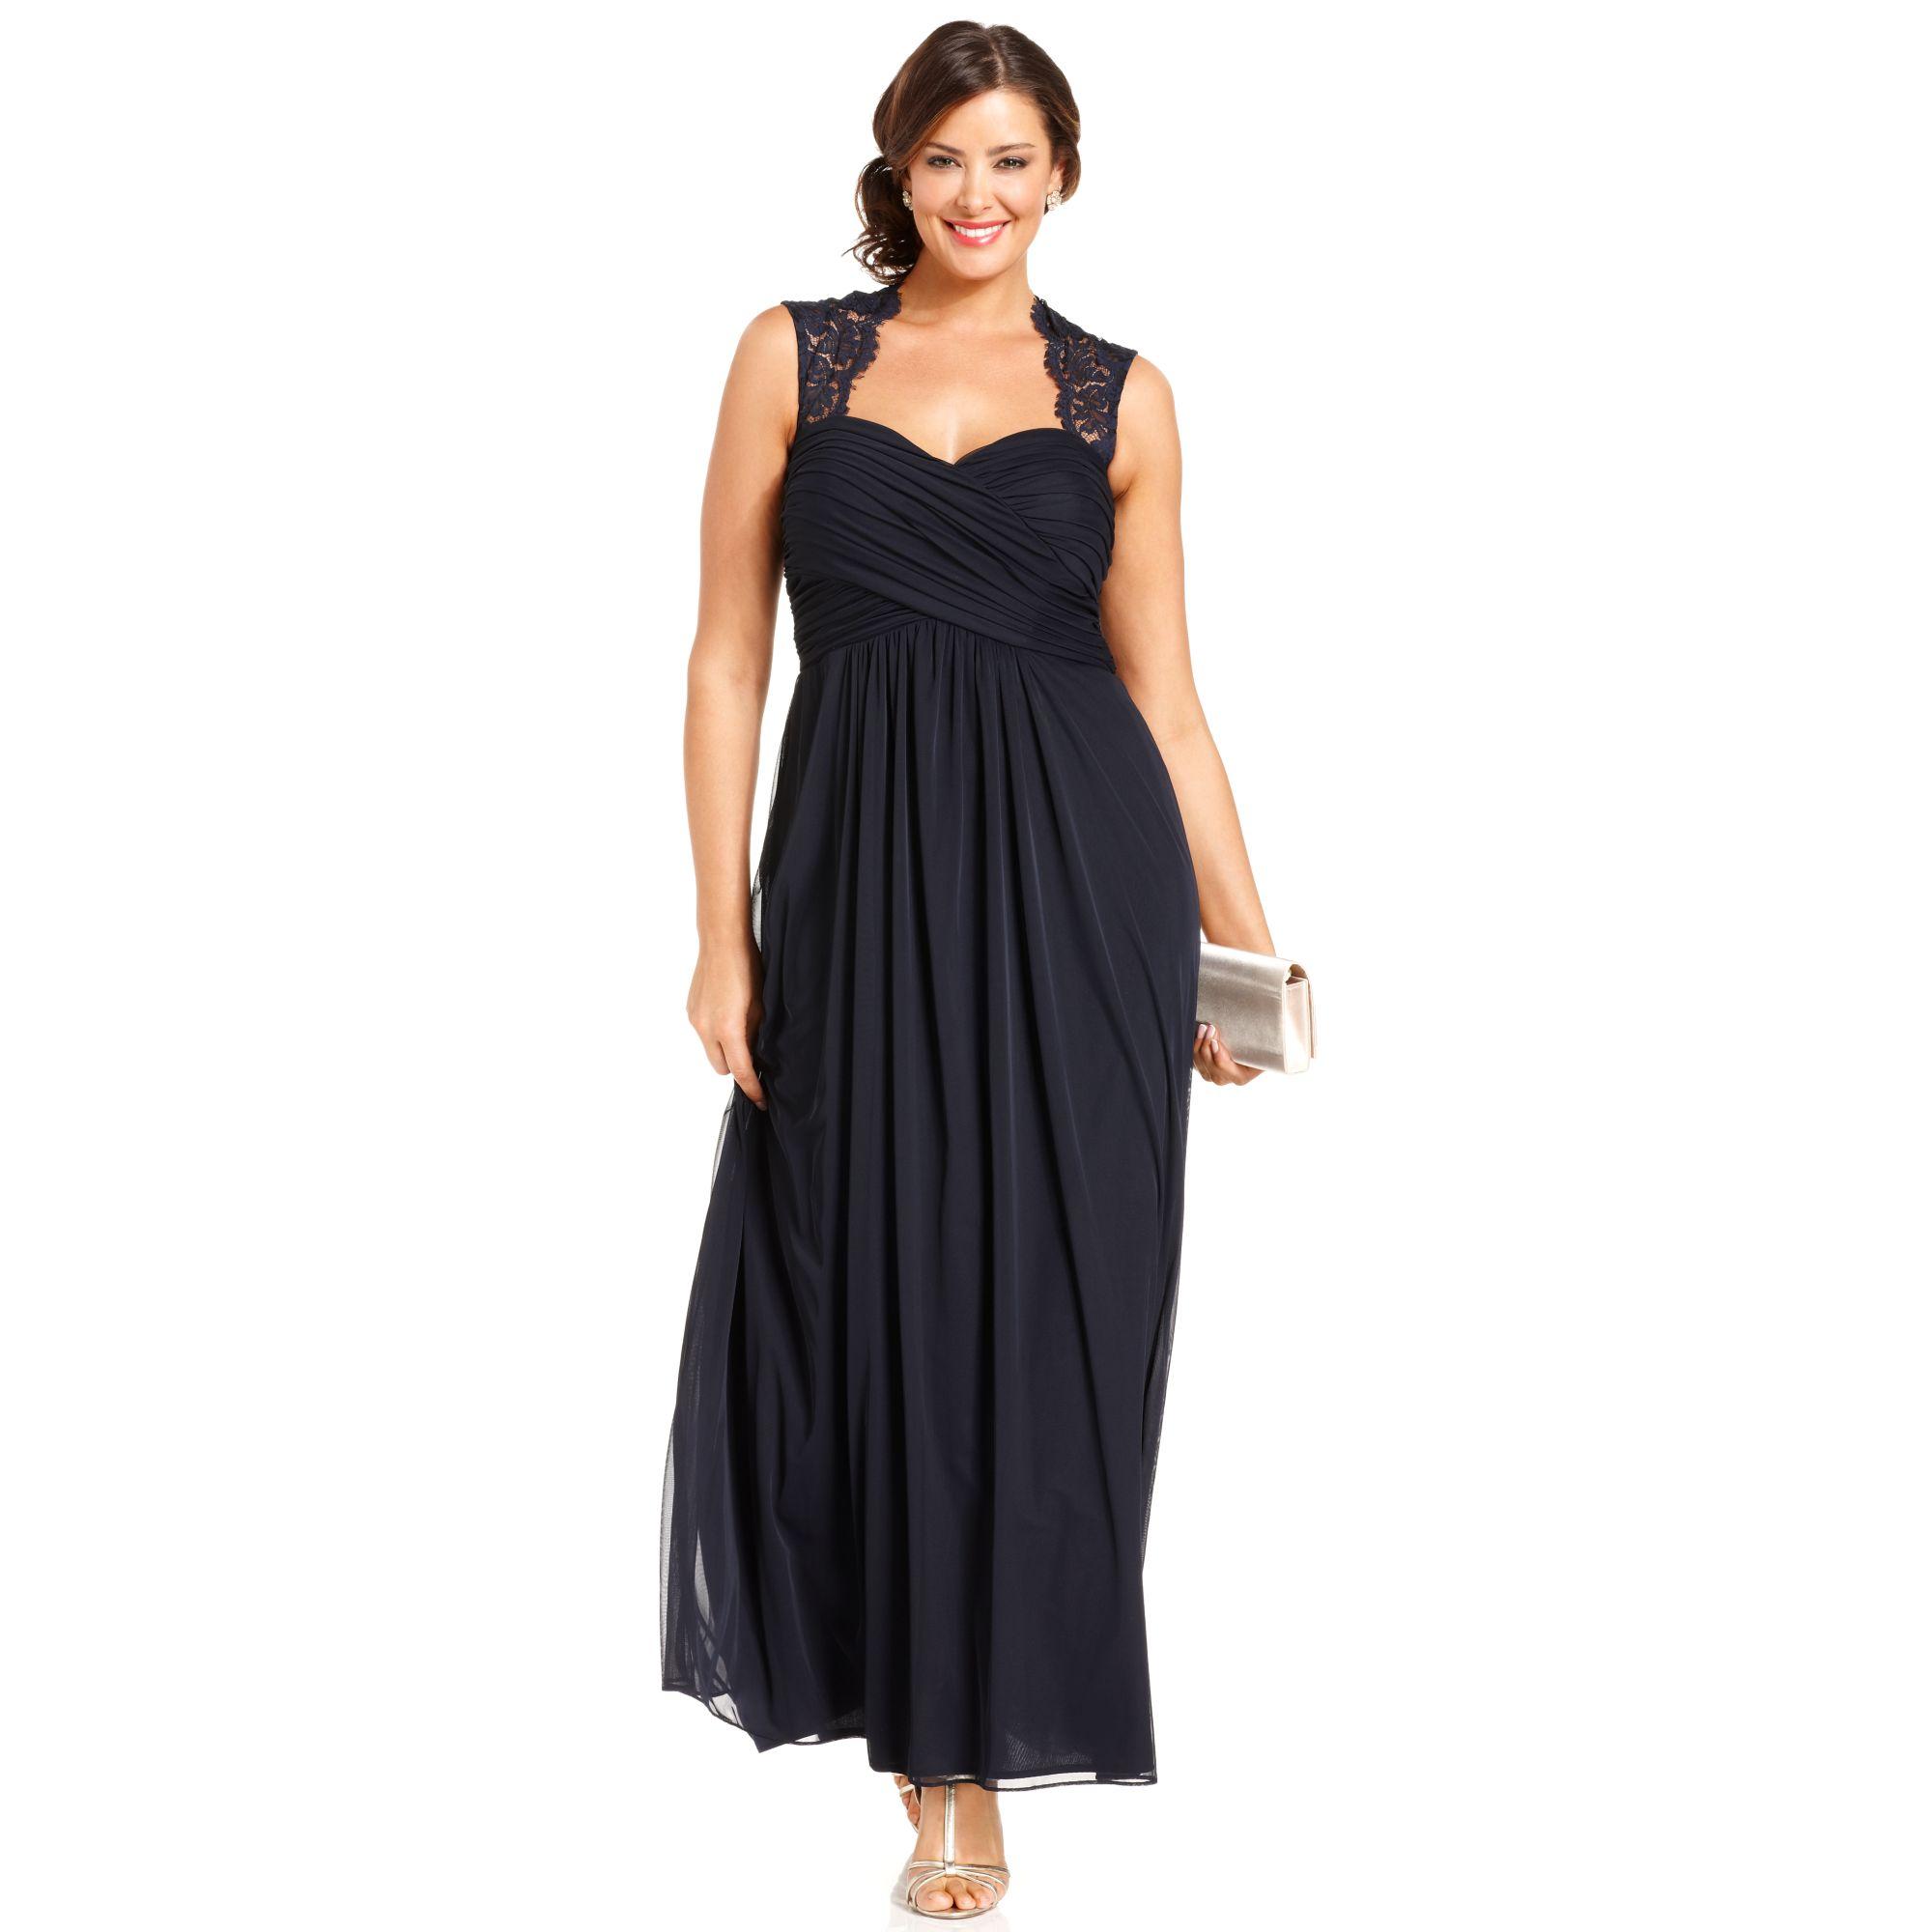 Xscape Xscape Plus Size Dress Sleeveless Laceback Empirewaist in ...